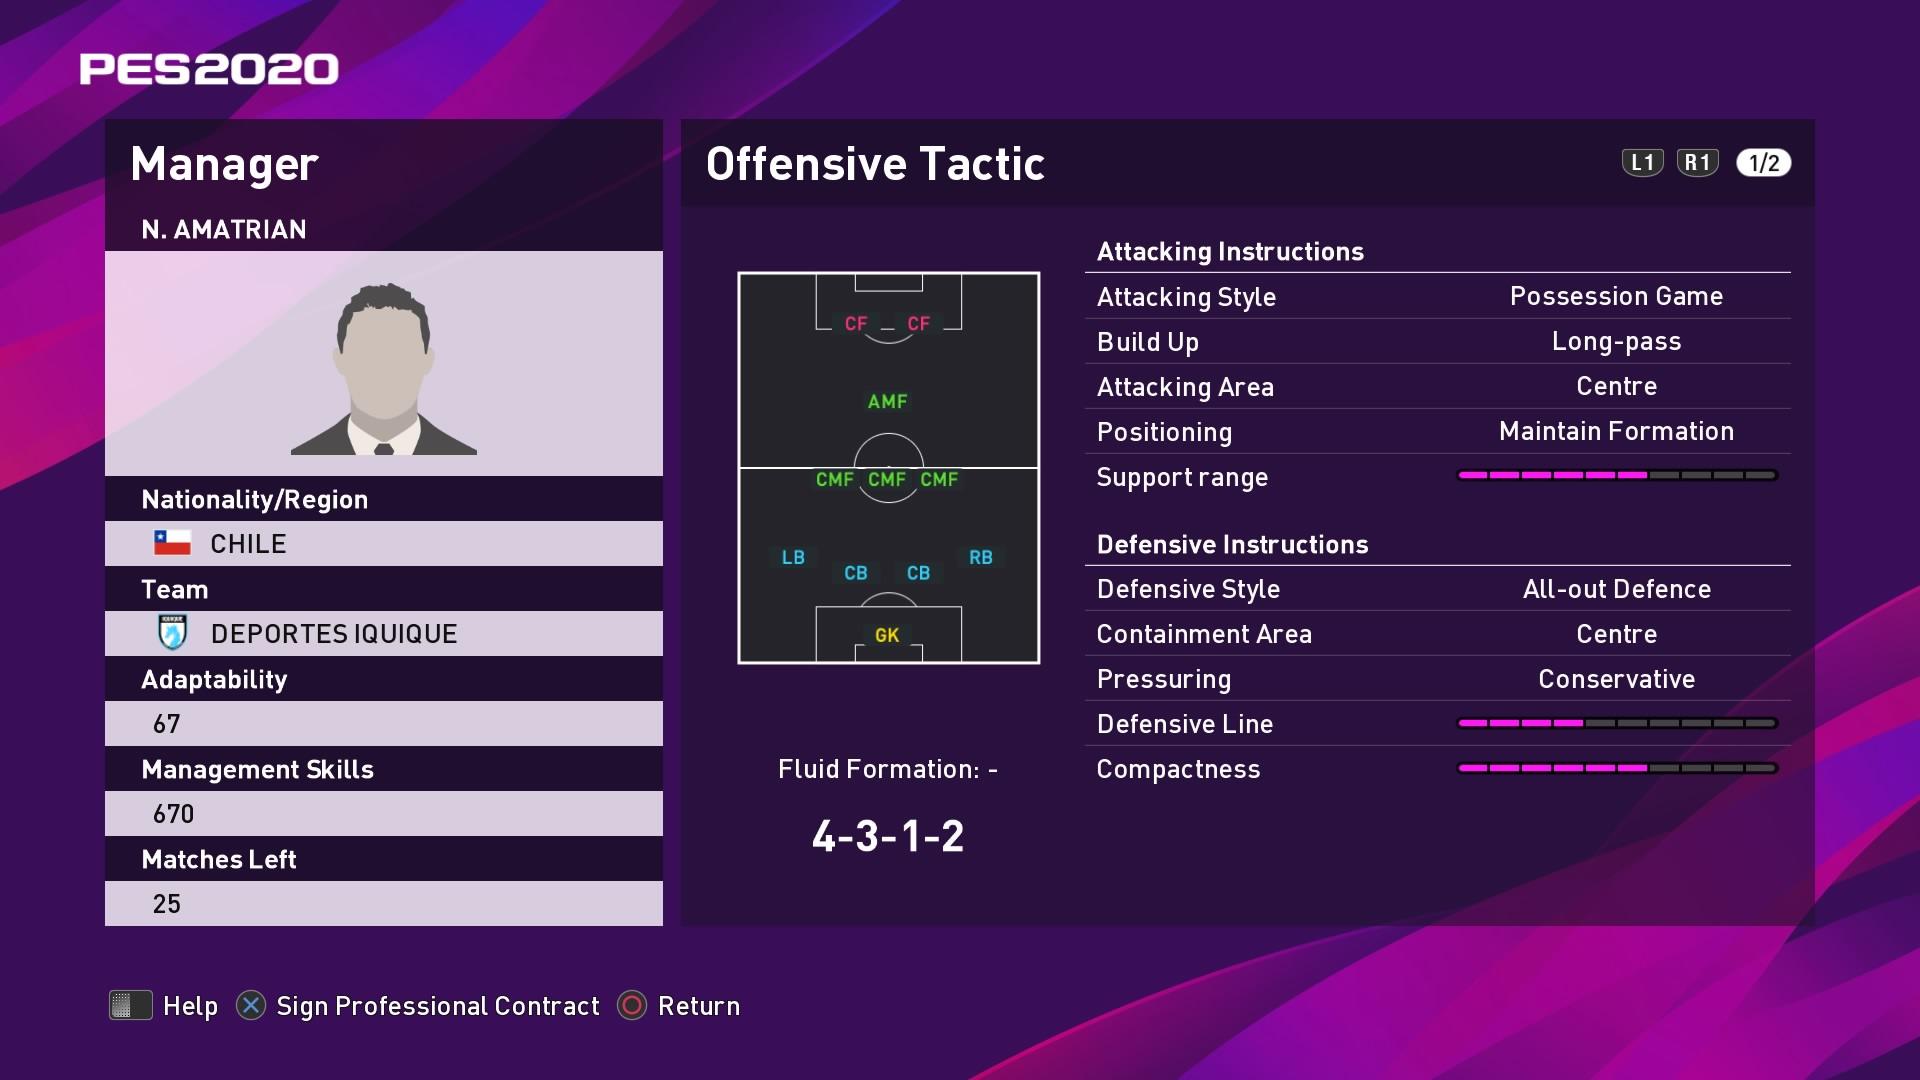 N. Amatrian (Jaime Vera) Offensive Tactic in PES 2020 myClub